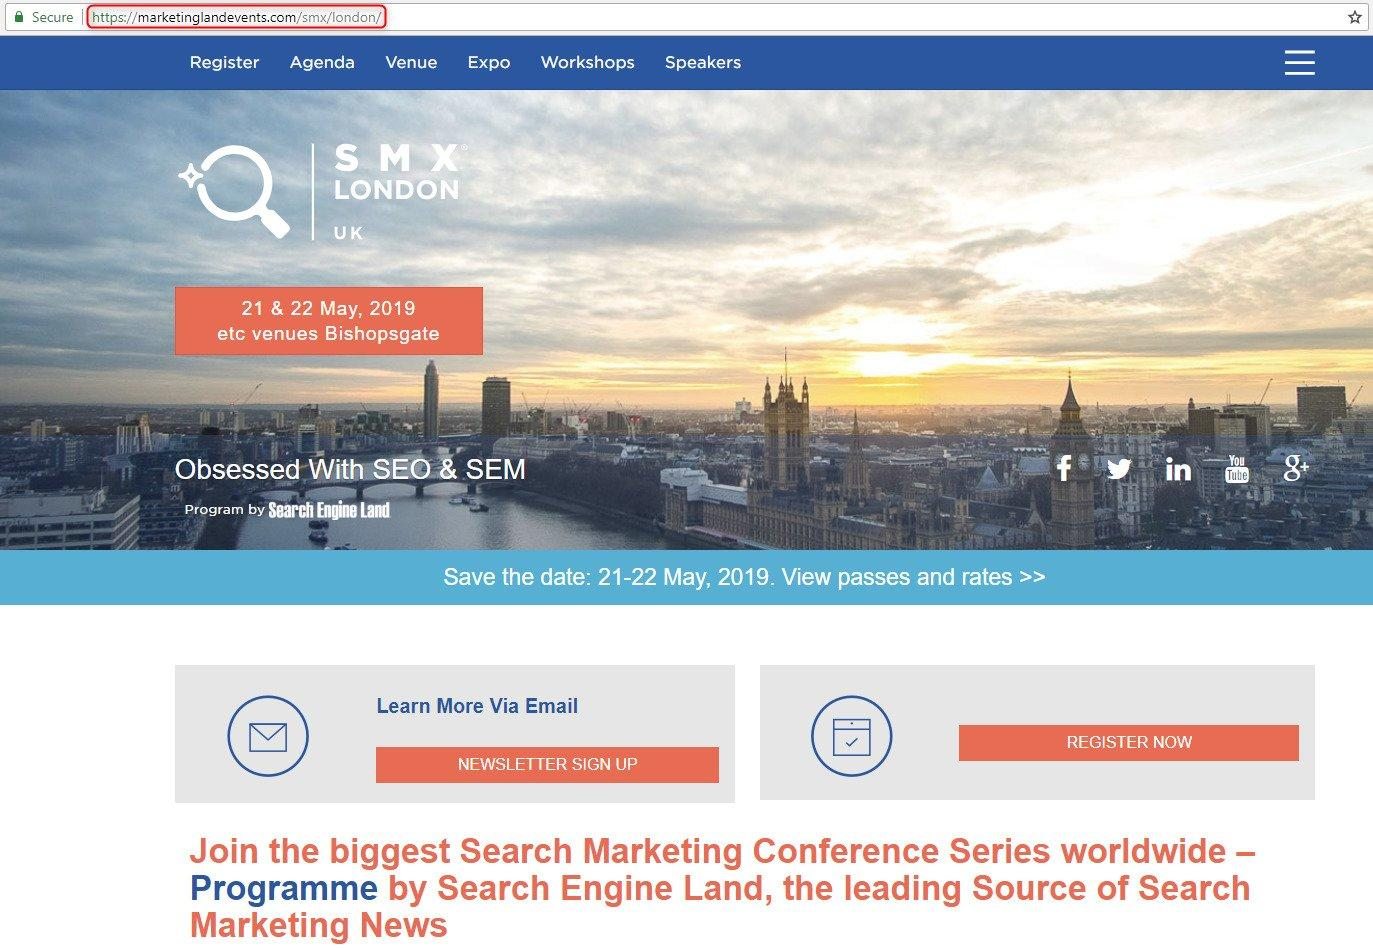 marketing-land-event-custom-affinity-audiences